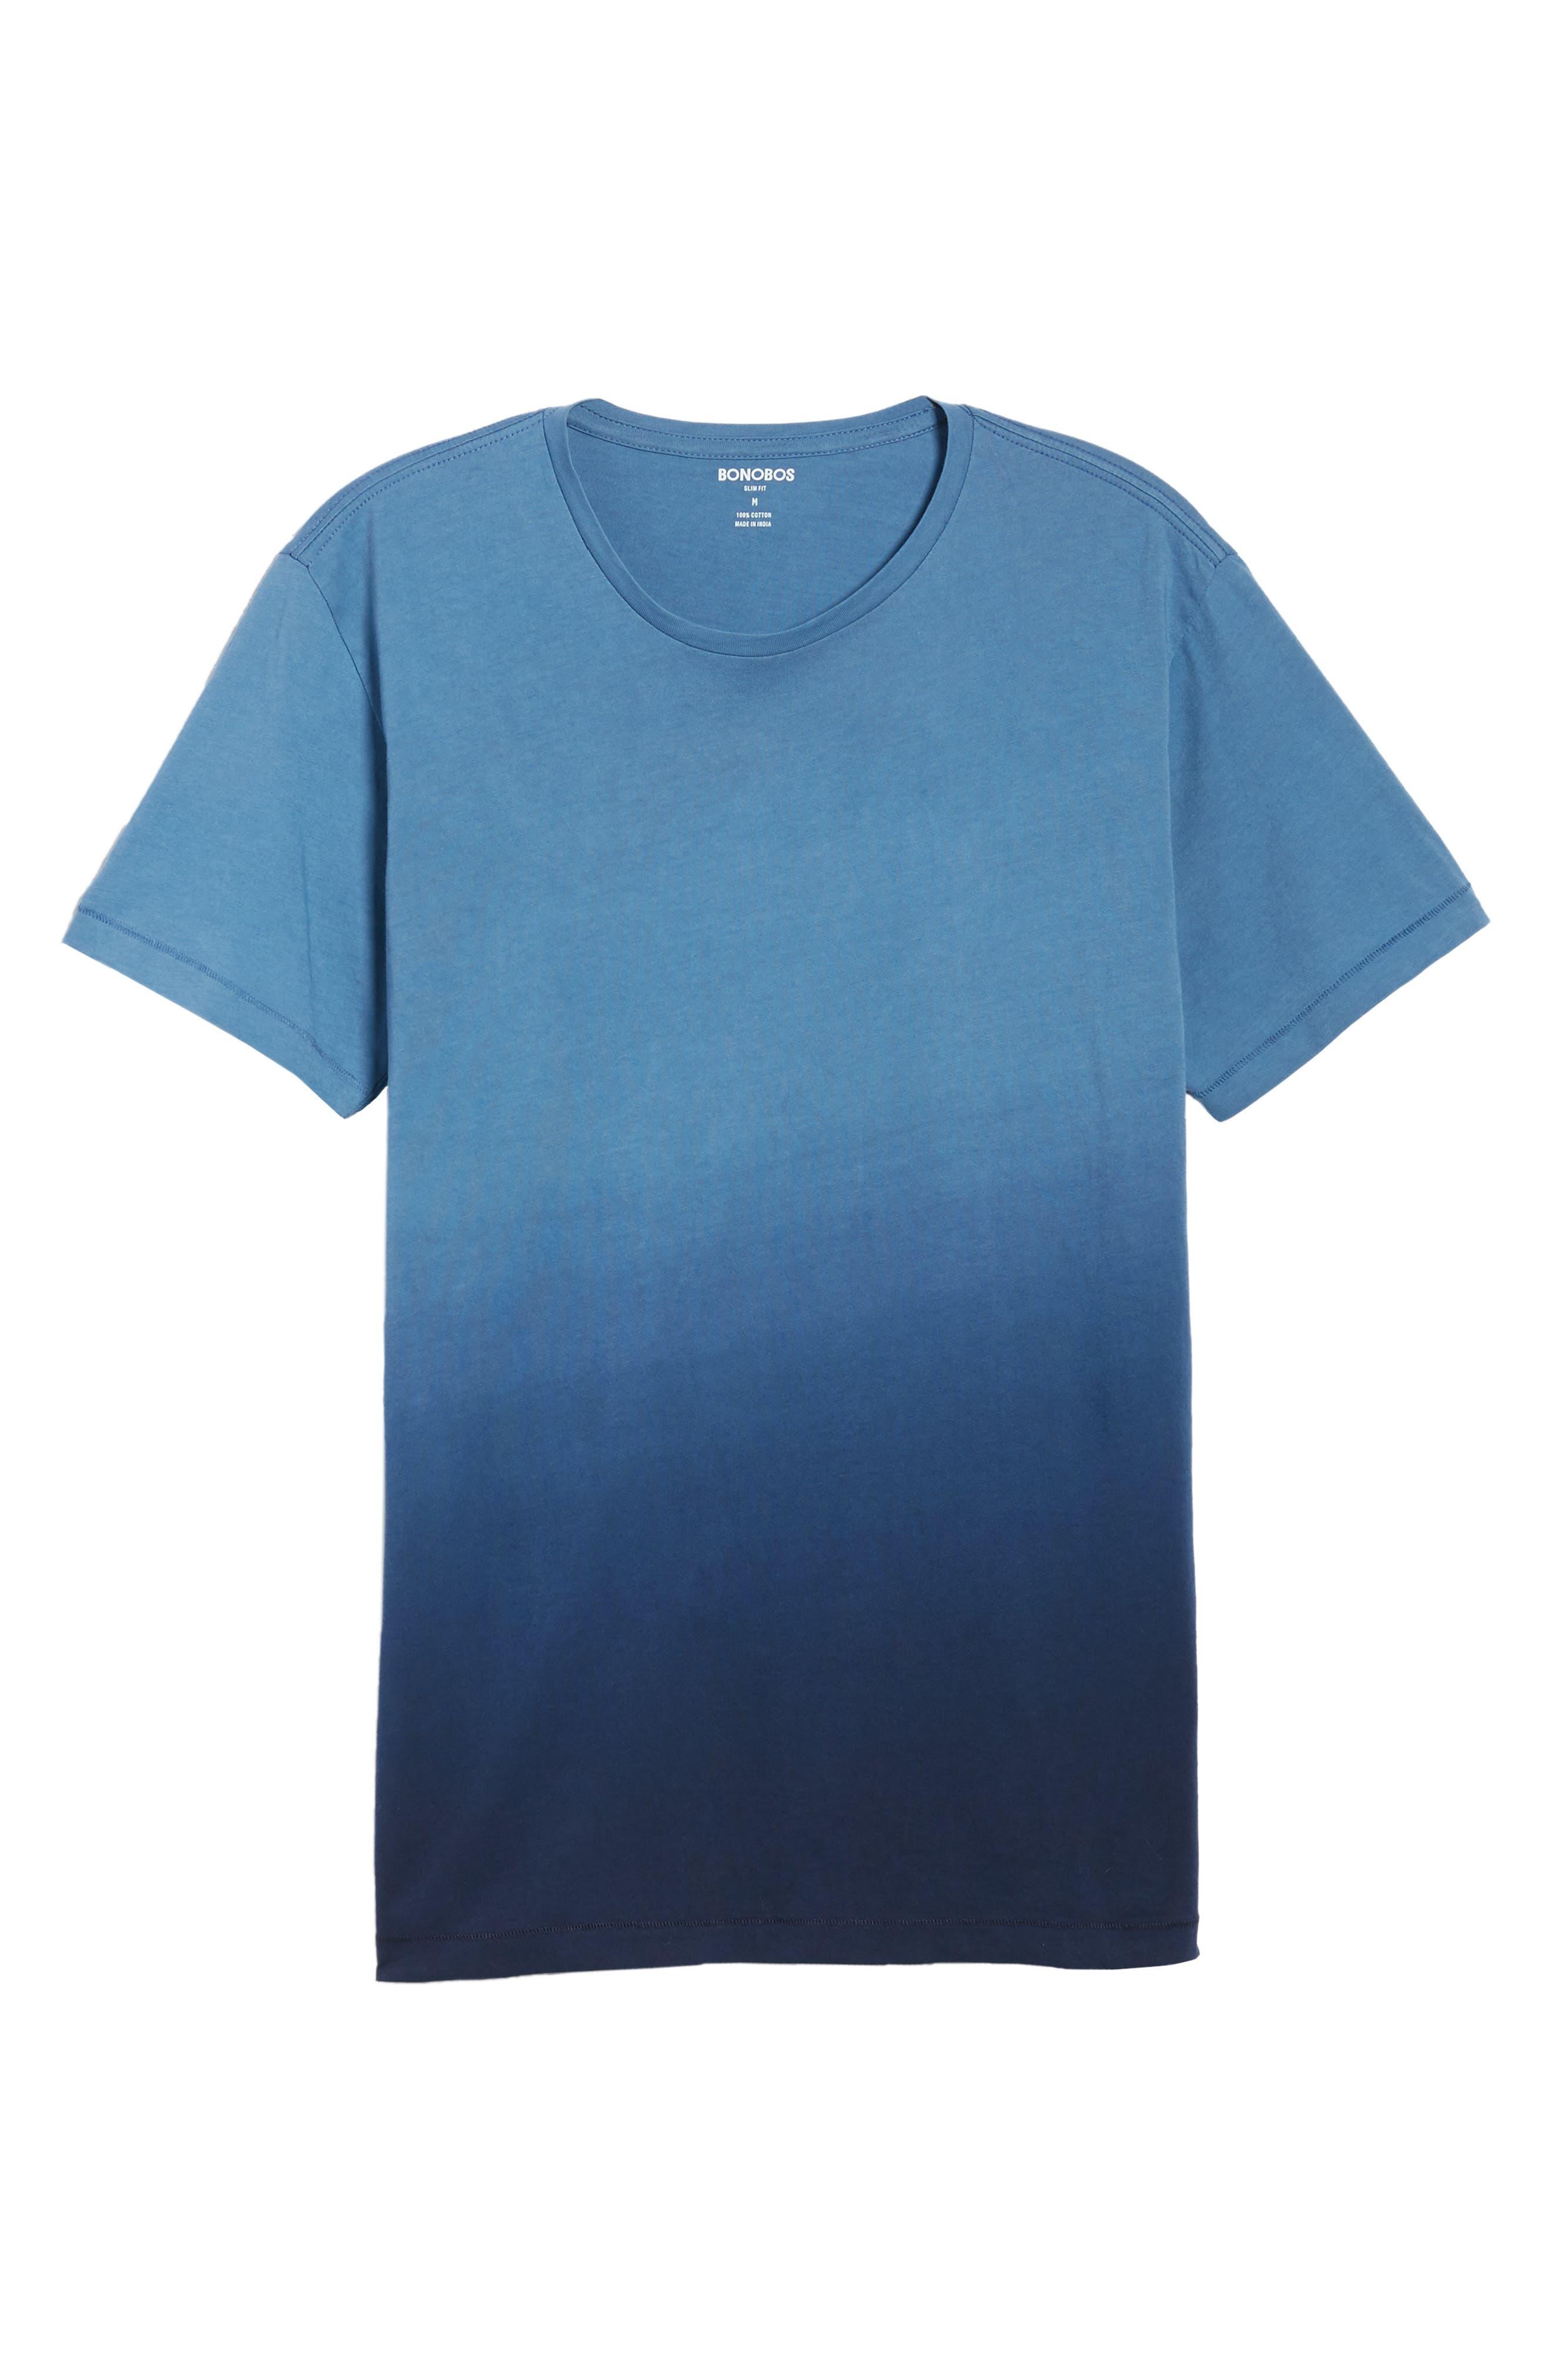 Dip Dye T-Shirt,                             Alternate thumbnail 6, color,                             400